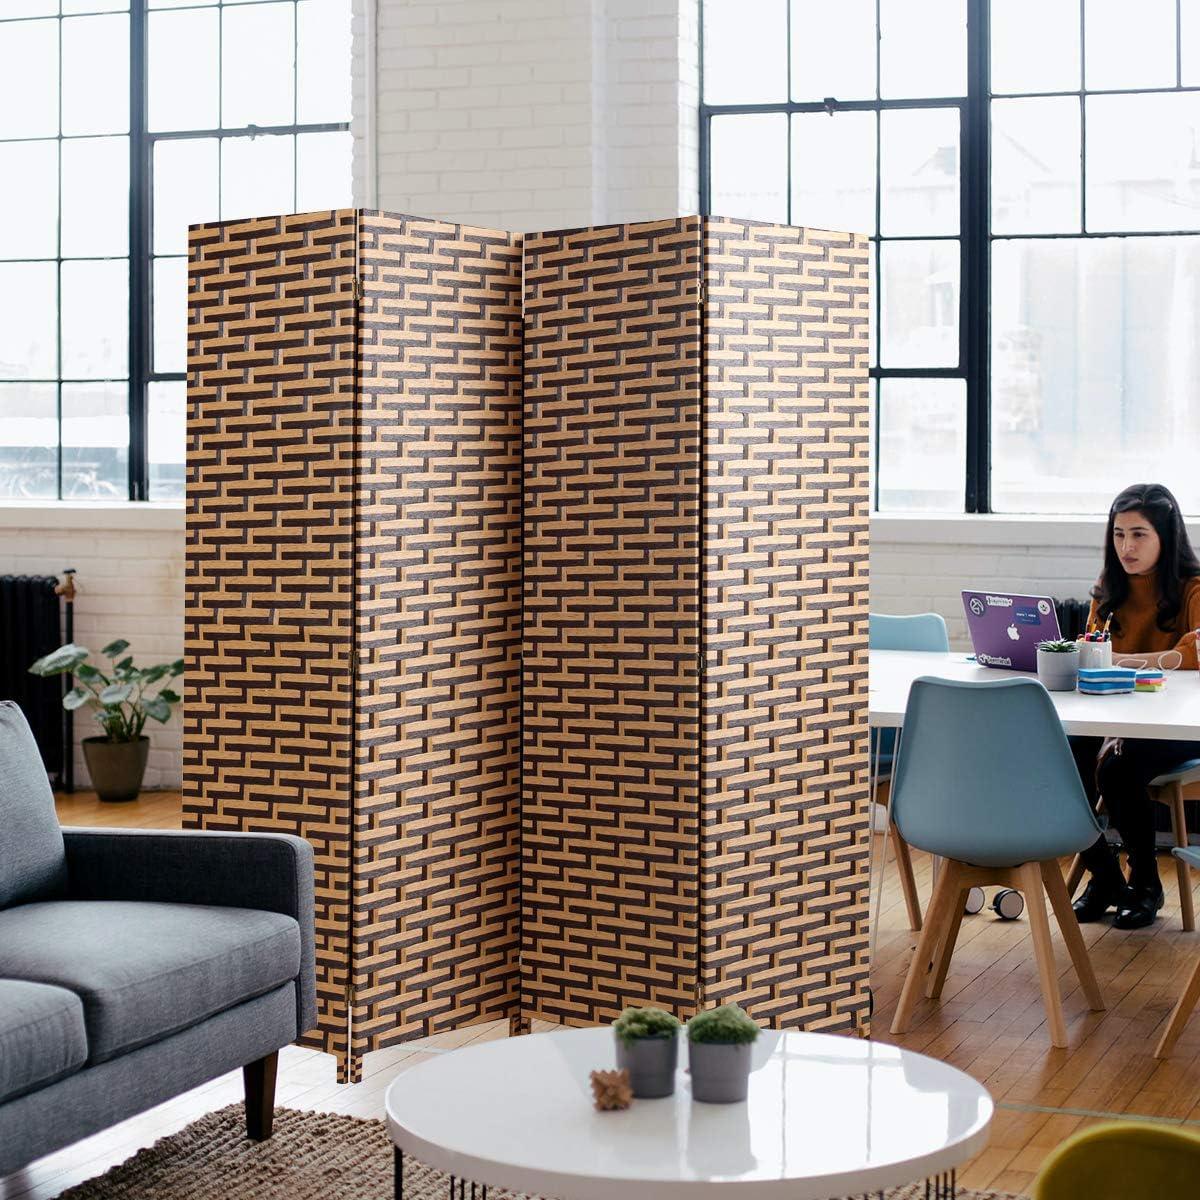 6ft Tall Room Divider 4-Panel Weave Fiber Folding Freestanding Privacy Screen for Living Room Bedroom (Light Brown)